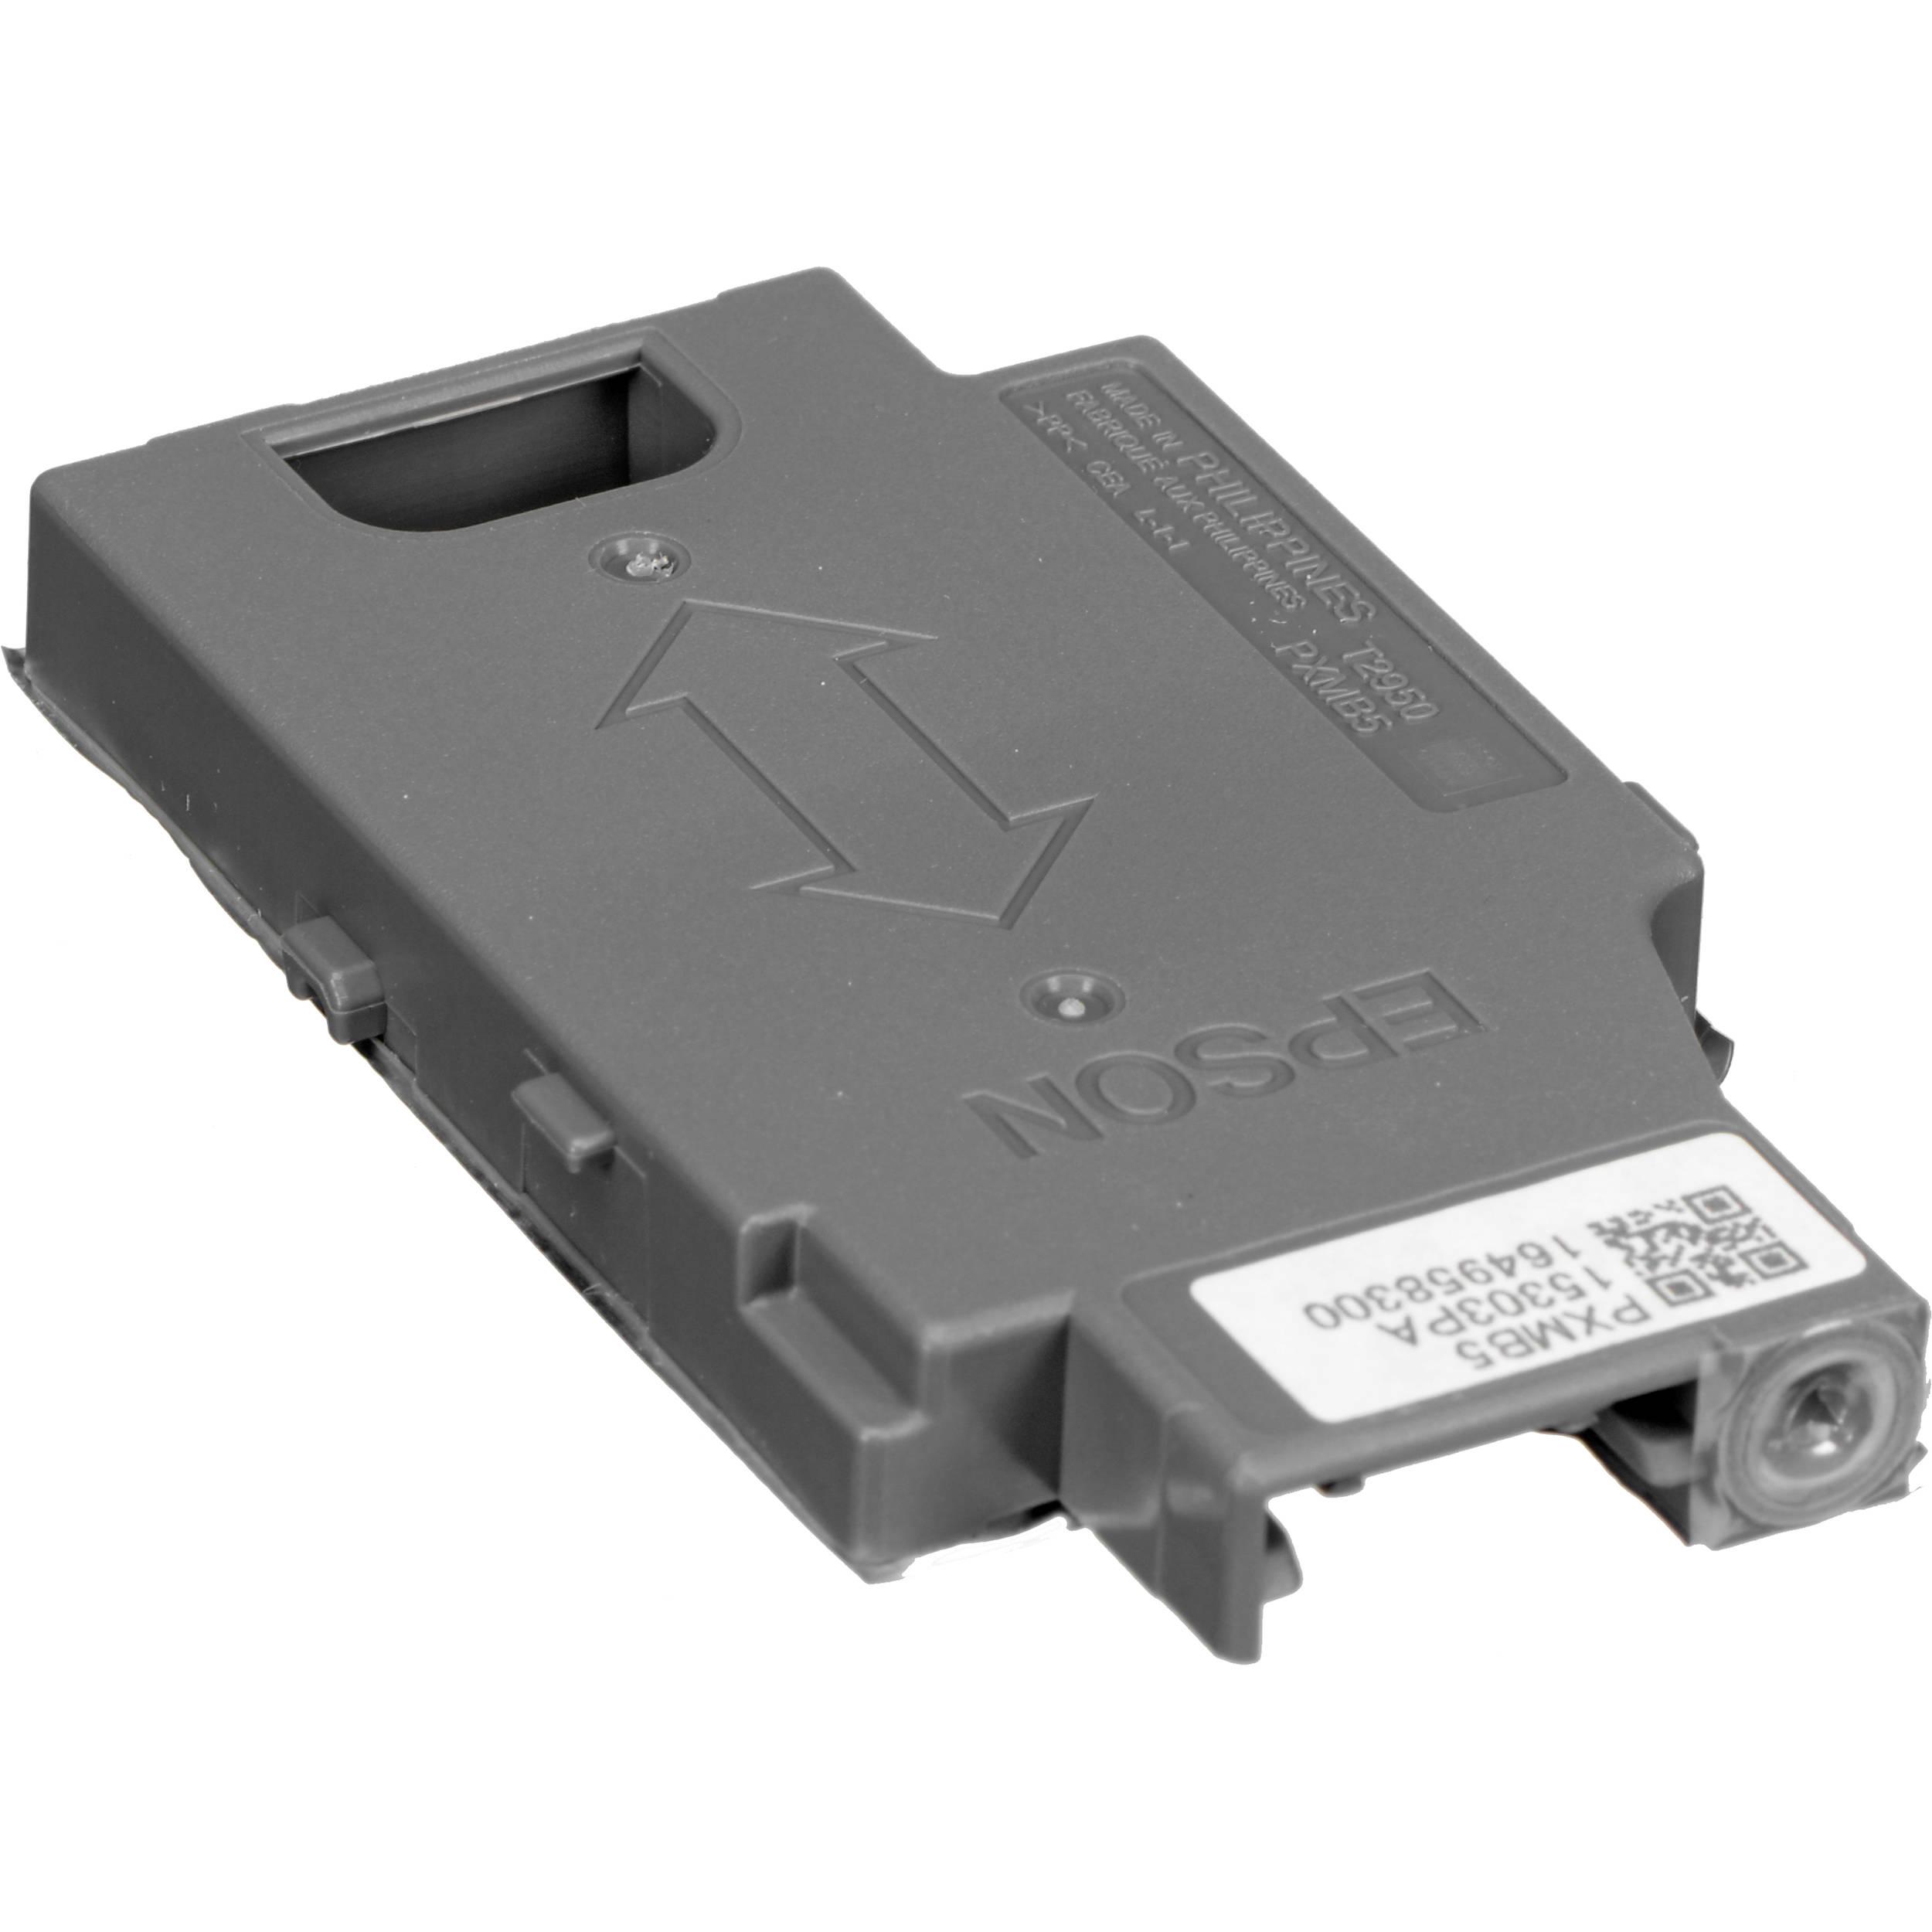 Epson T2950 Ink Maintenance Box for WorkForce WF-100 Printer